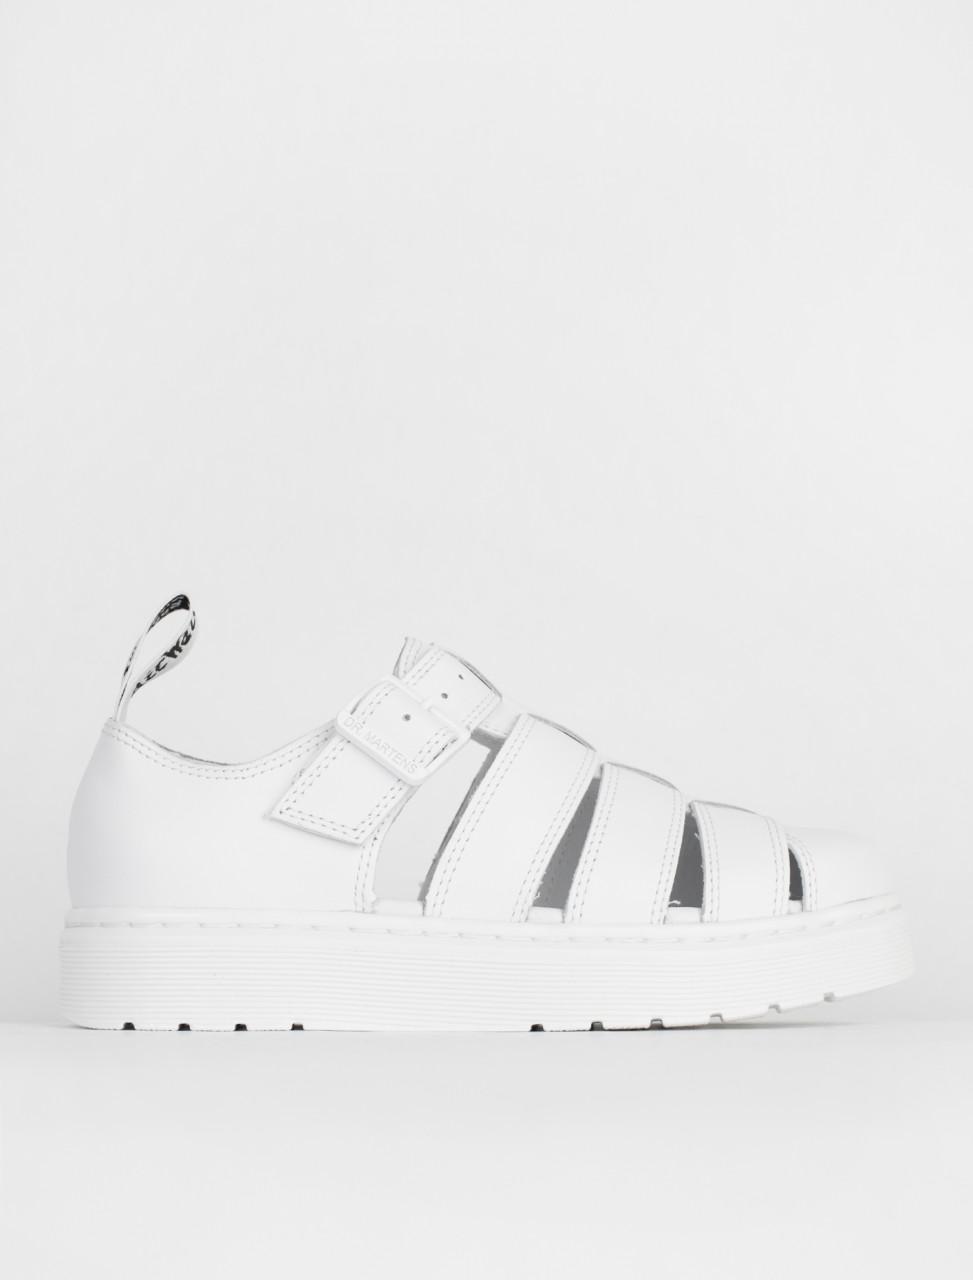 VIBAL Softy T Sandal